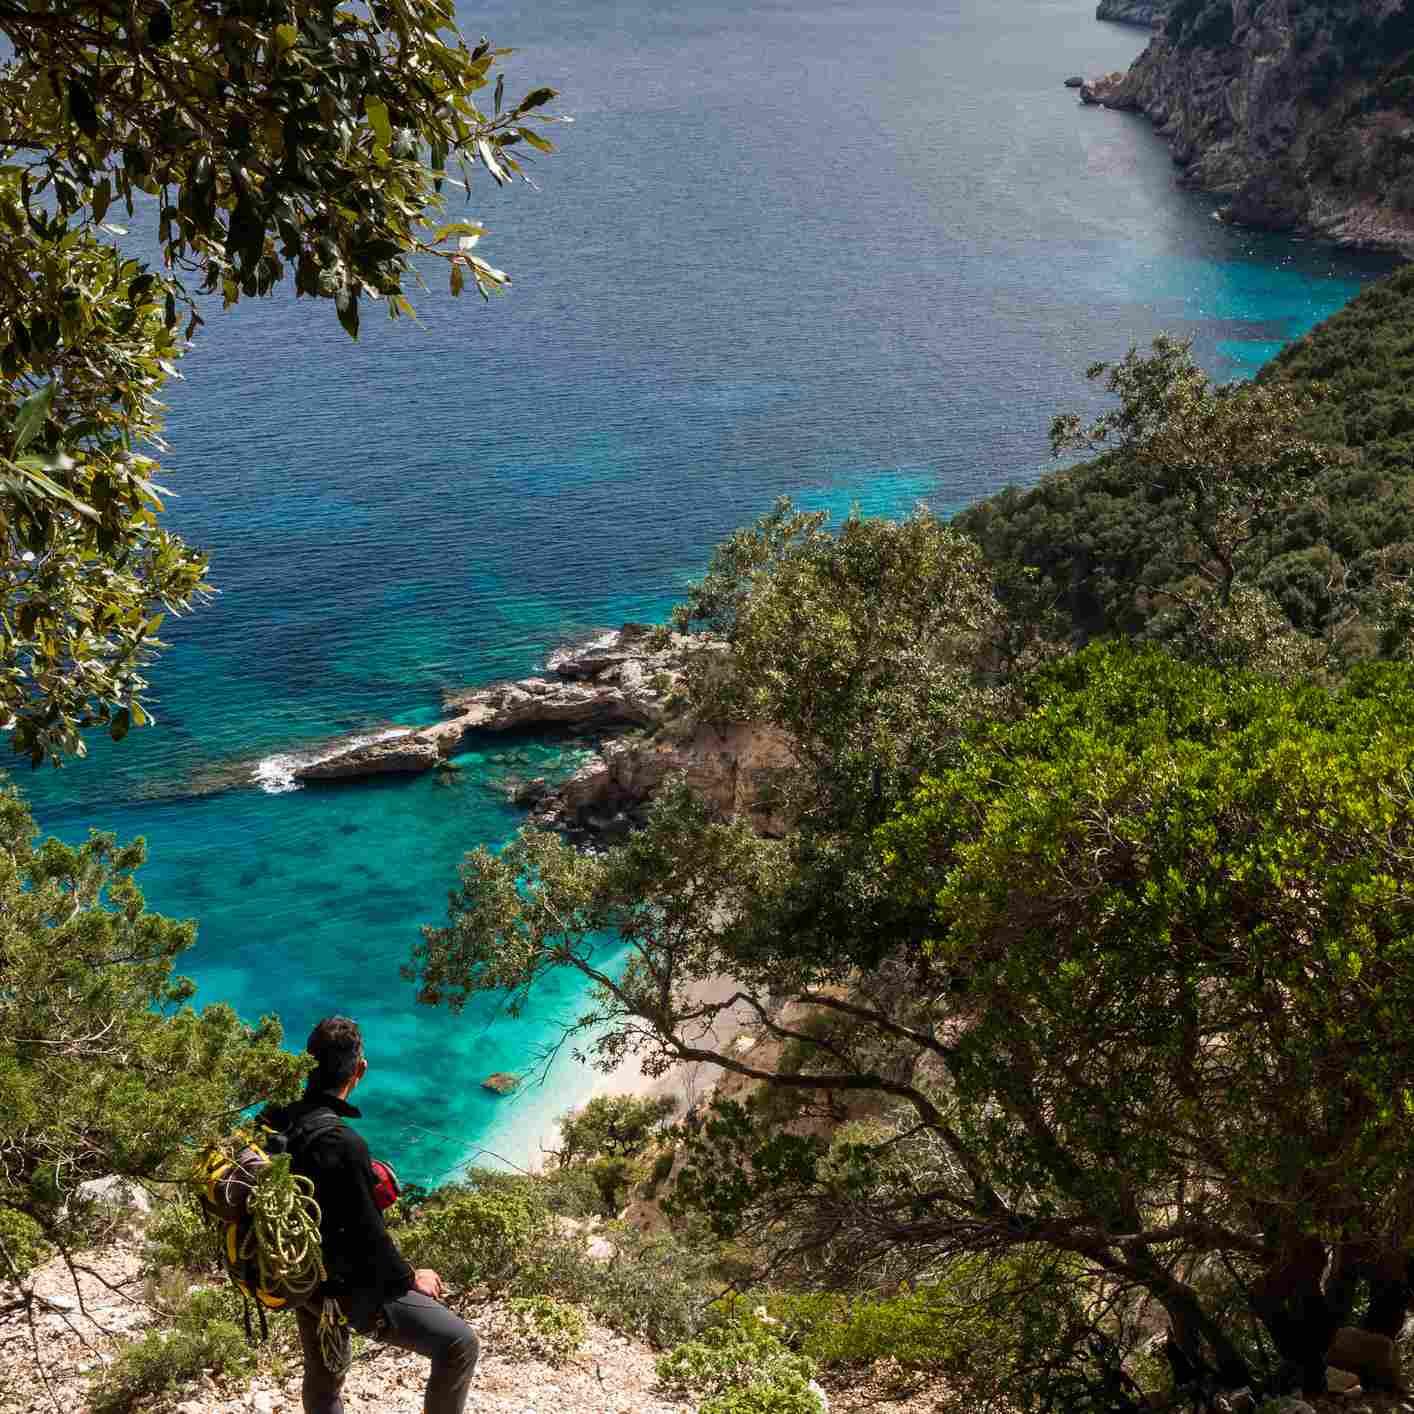 Along the 'Selvaggio Blu' the path approaches often at Mediterranean sea. Here a hiker admires the Cala Biriola beach.